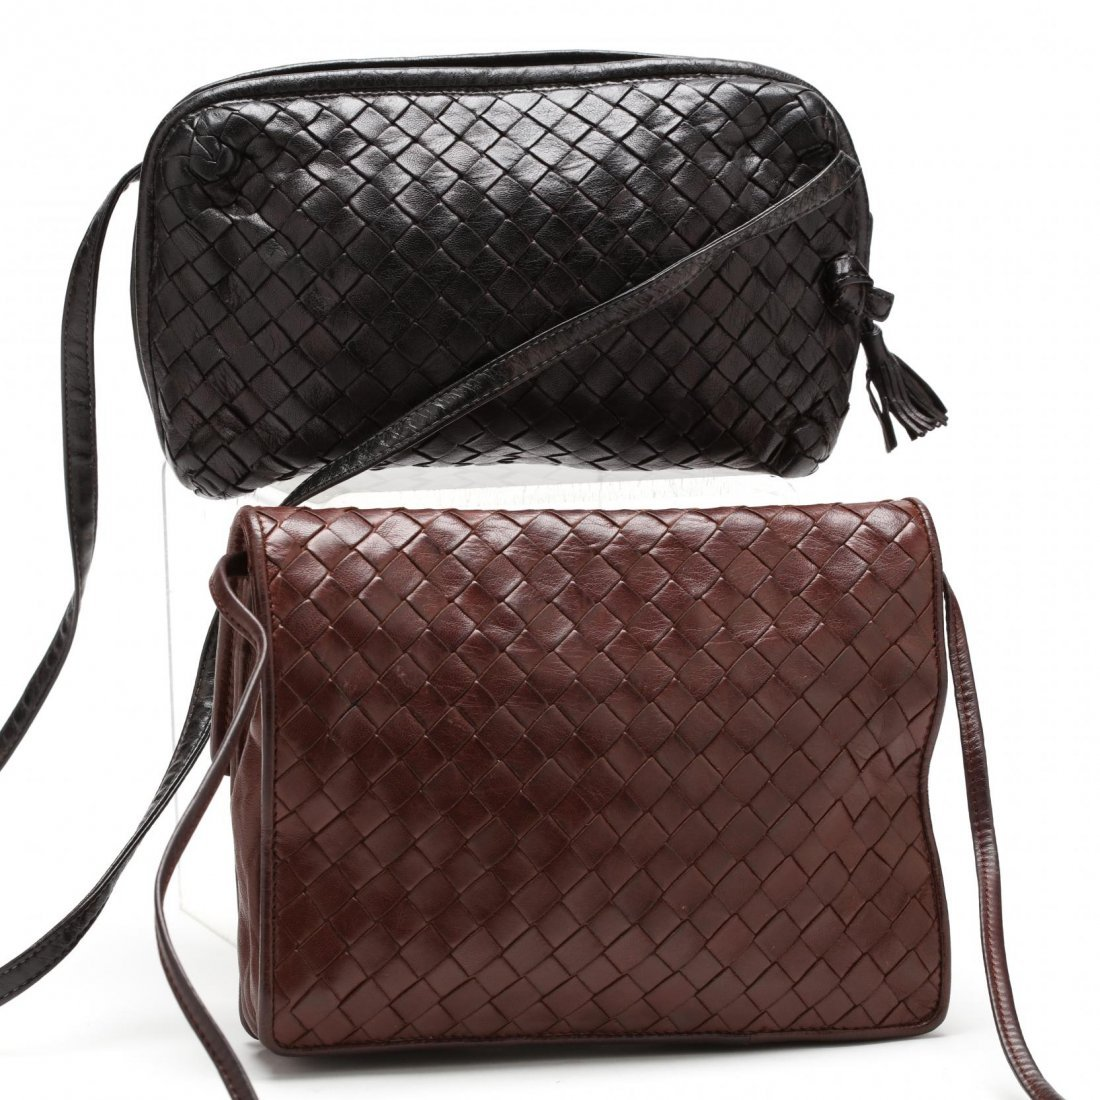 Two Cross-body Bags, Bottega Veneta - 2